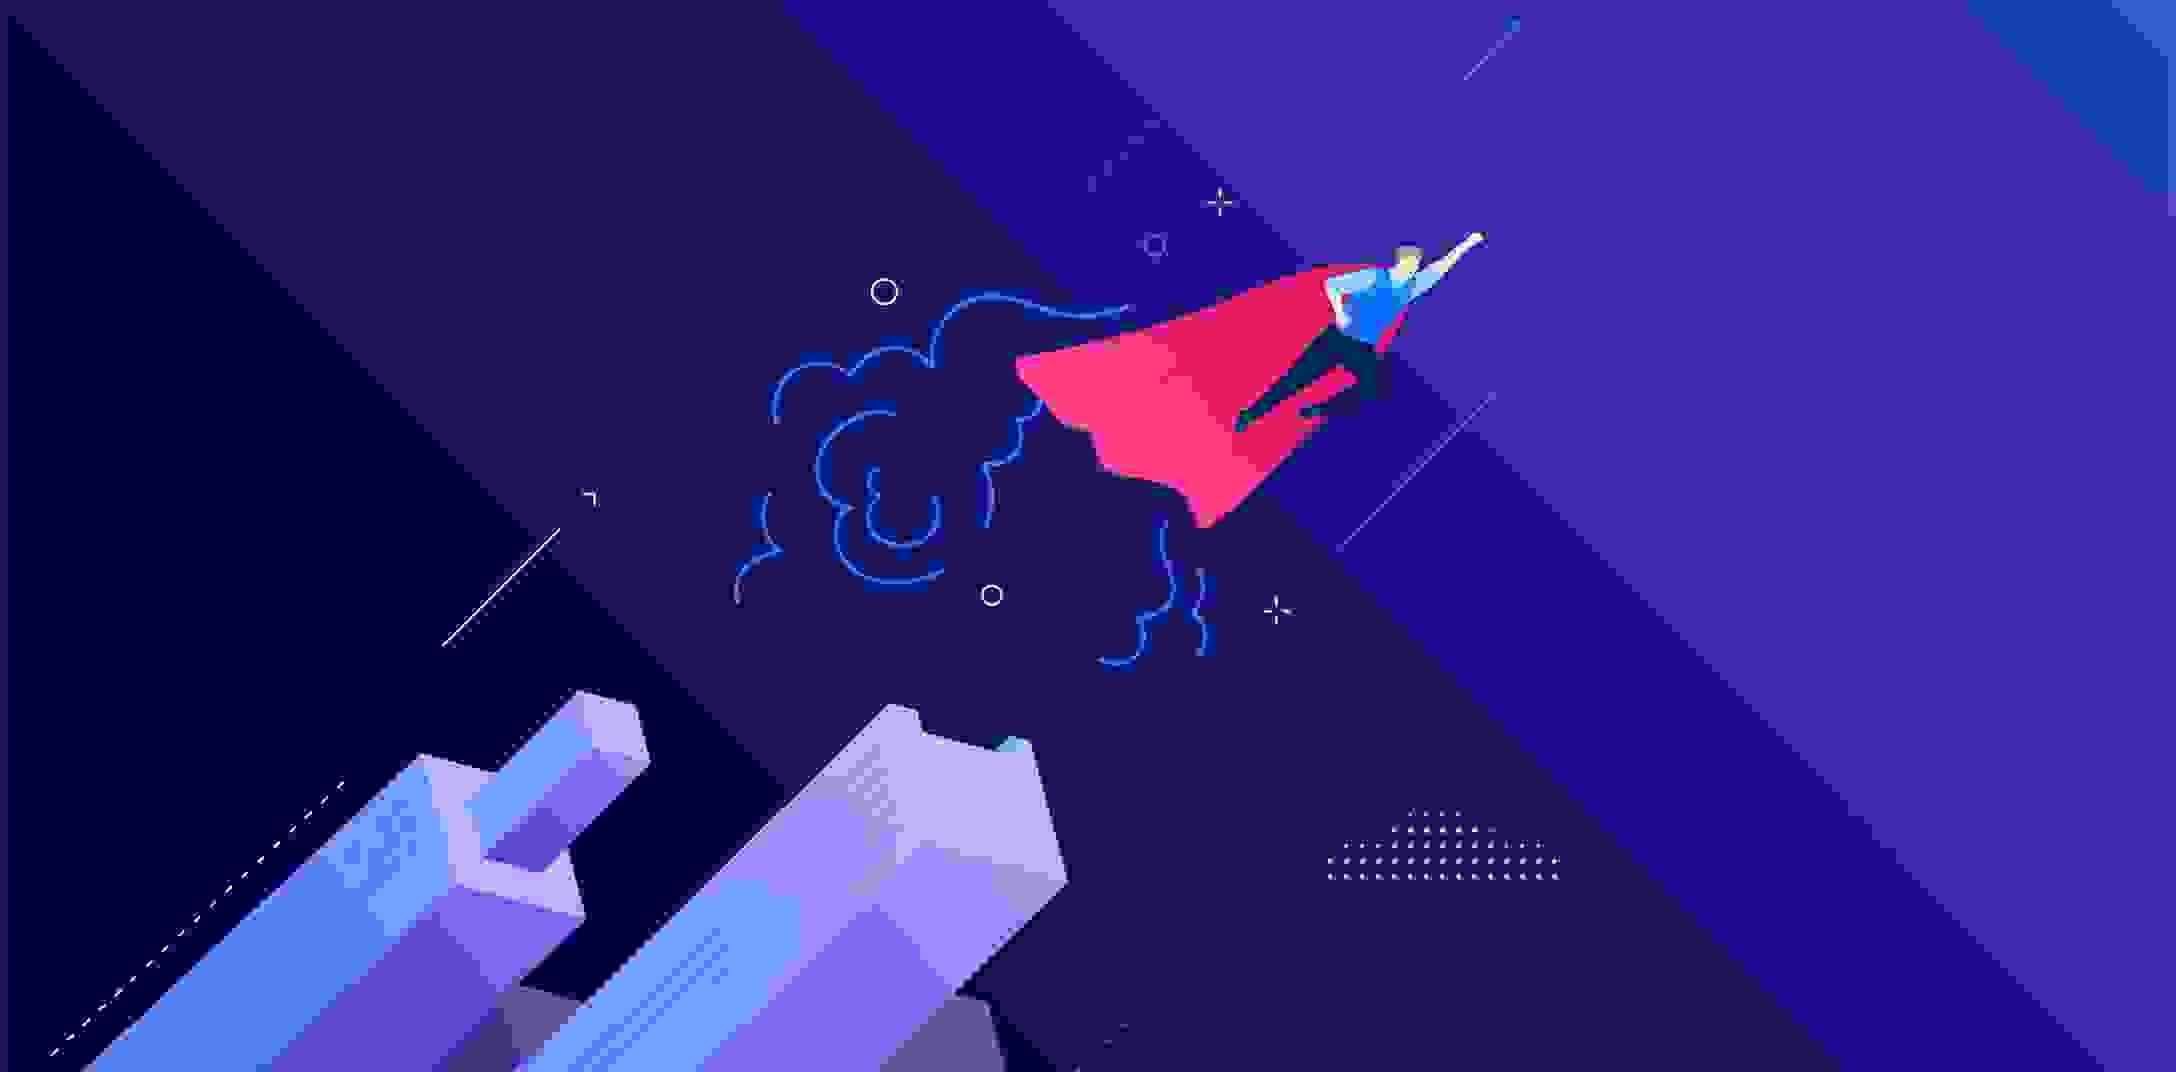 Superman flies skyward with the dark blue background